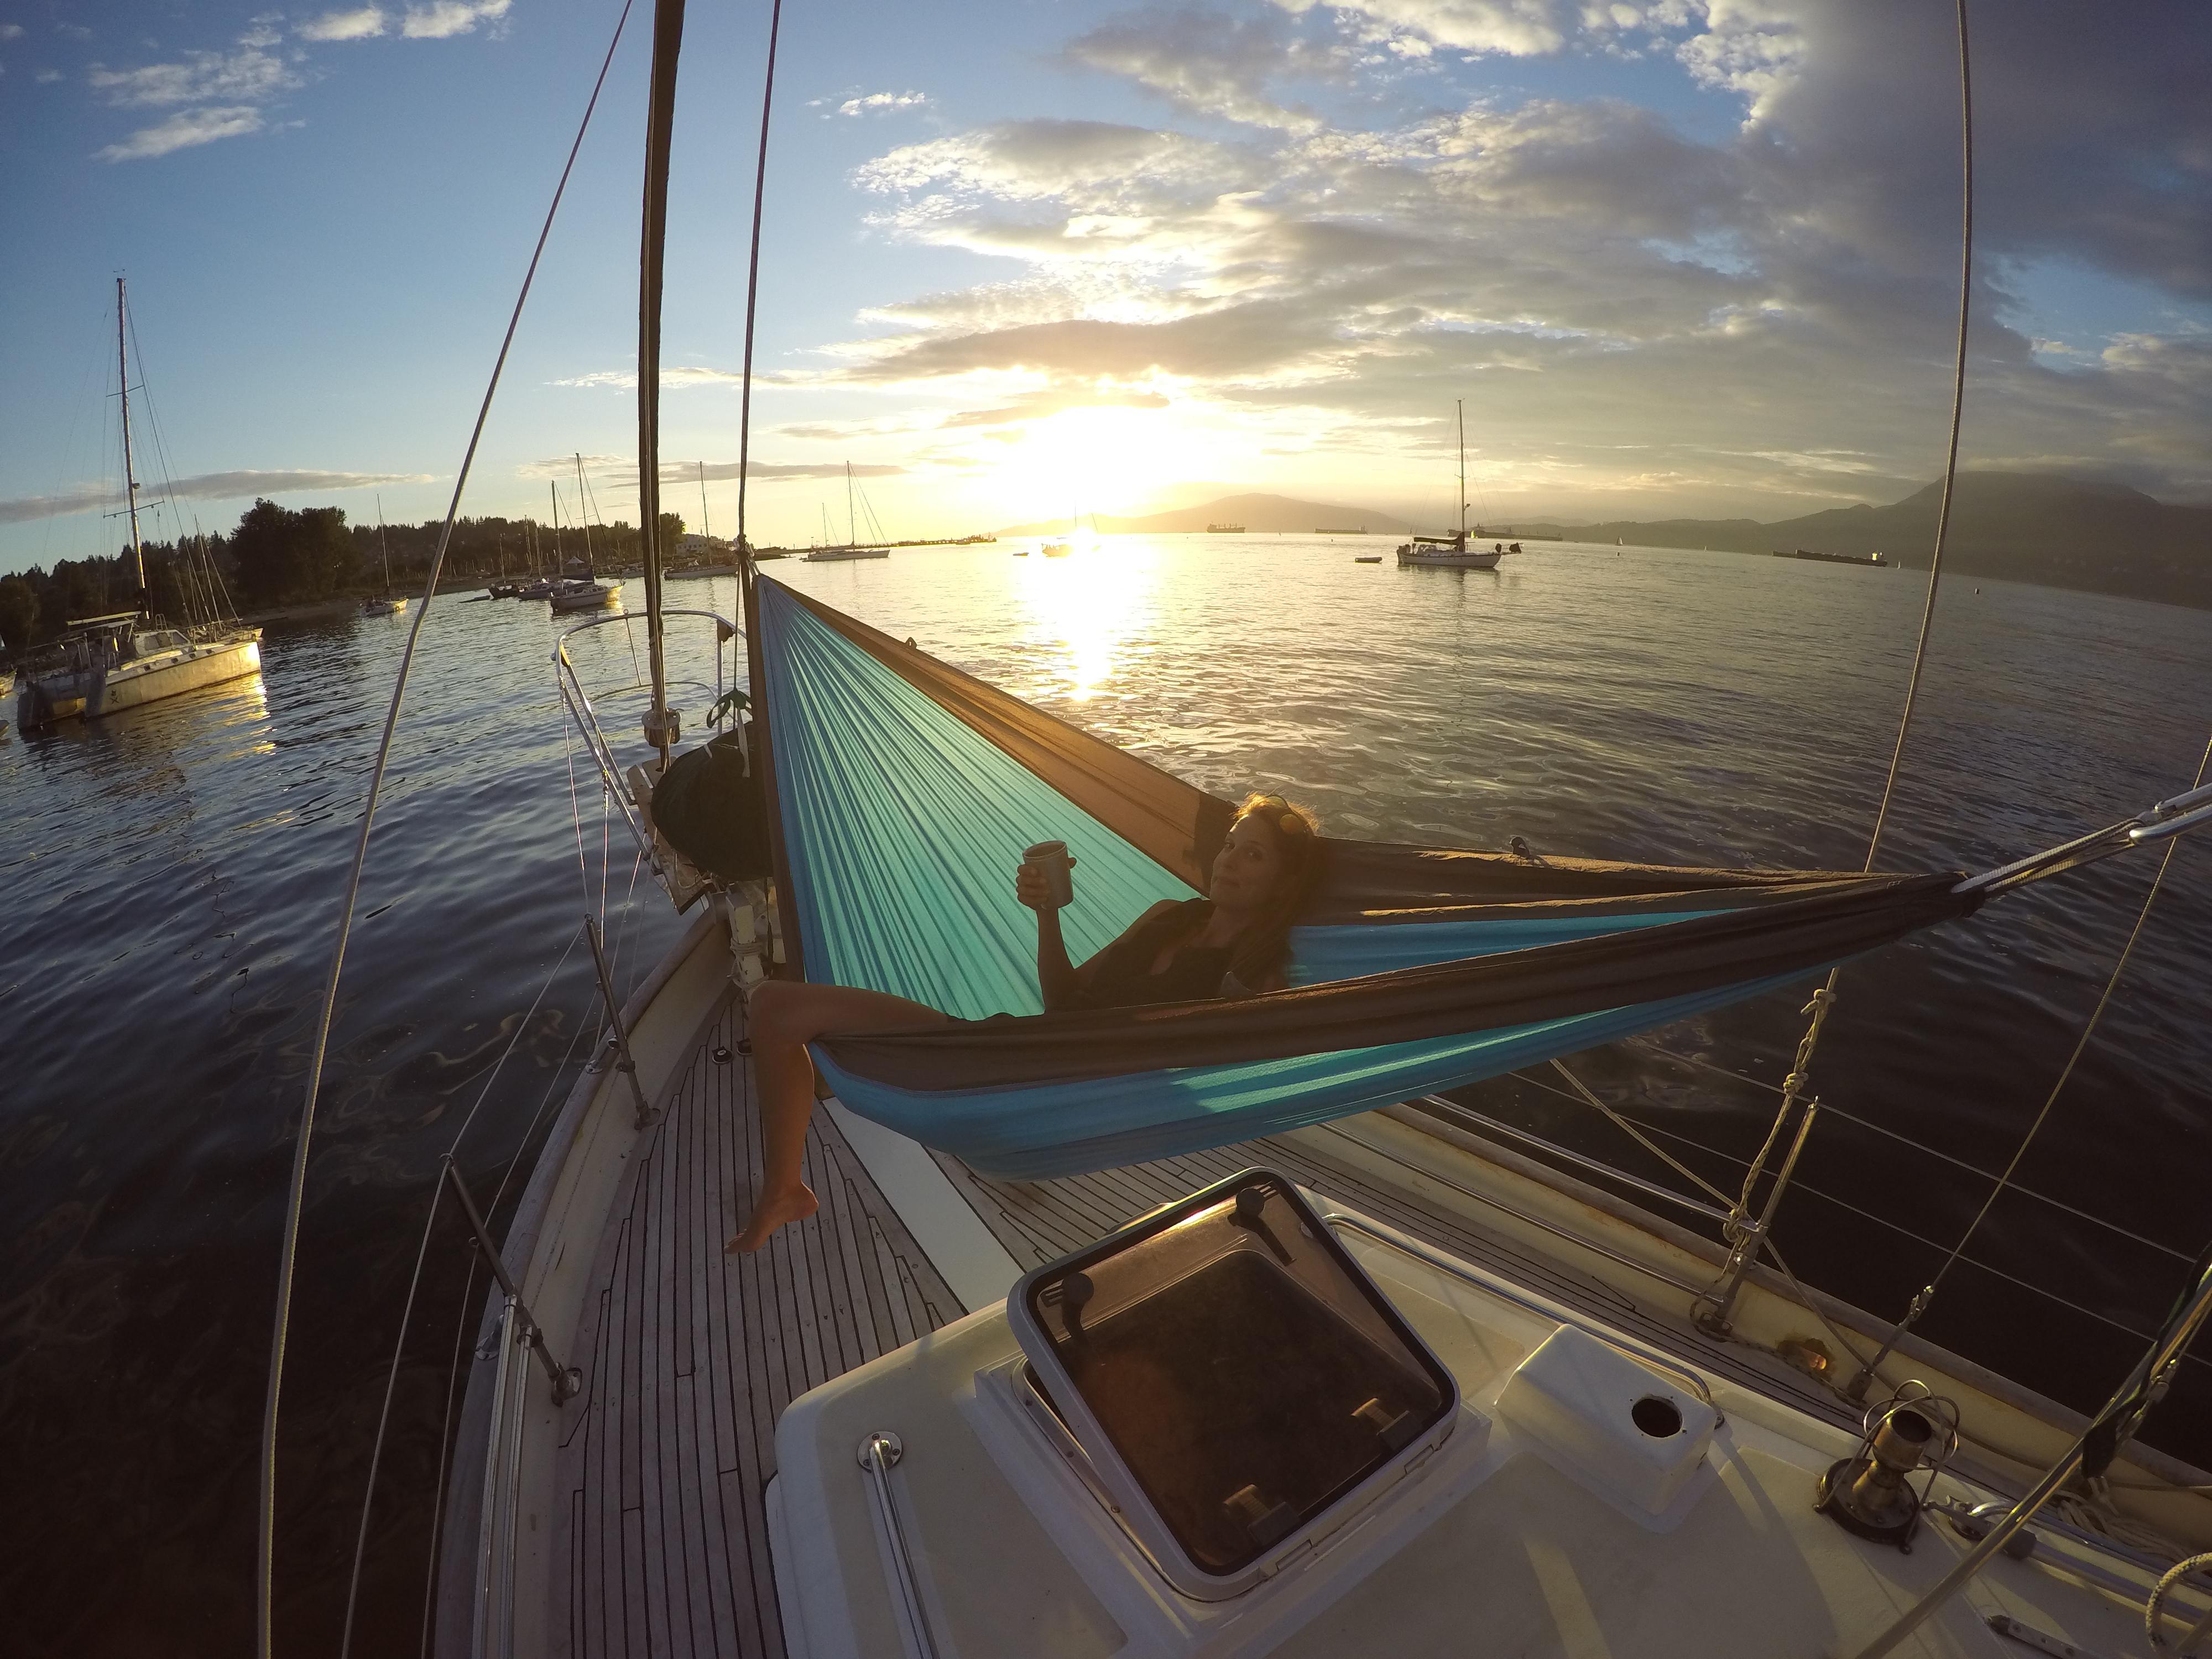 sailing union 36 vancouver folk festival